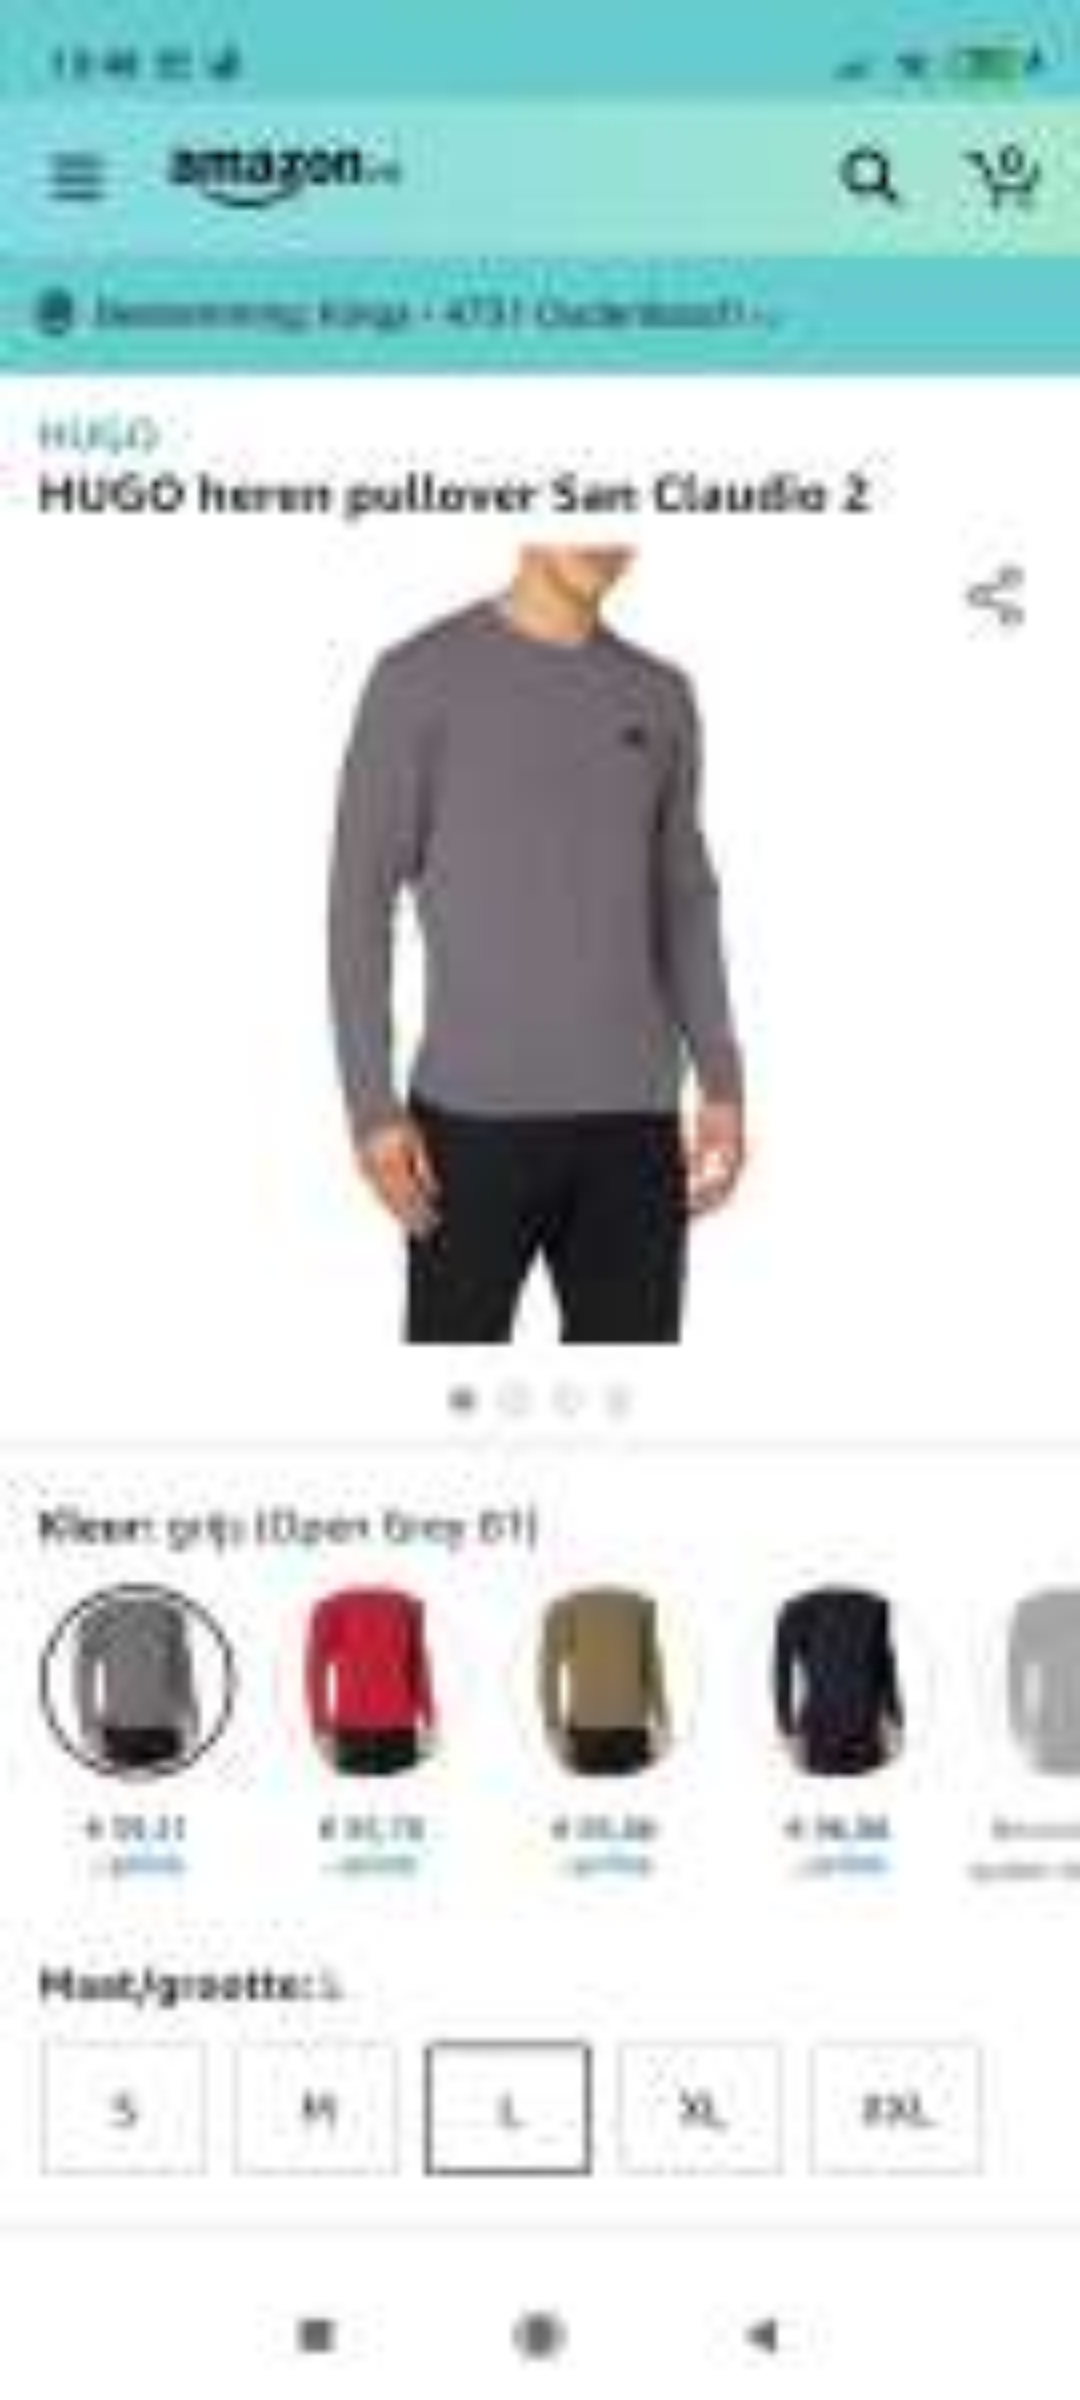 Amazon.nl HUGO heren pullover San Claudio 2